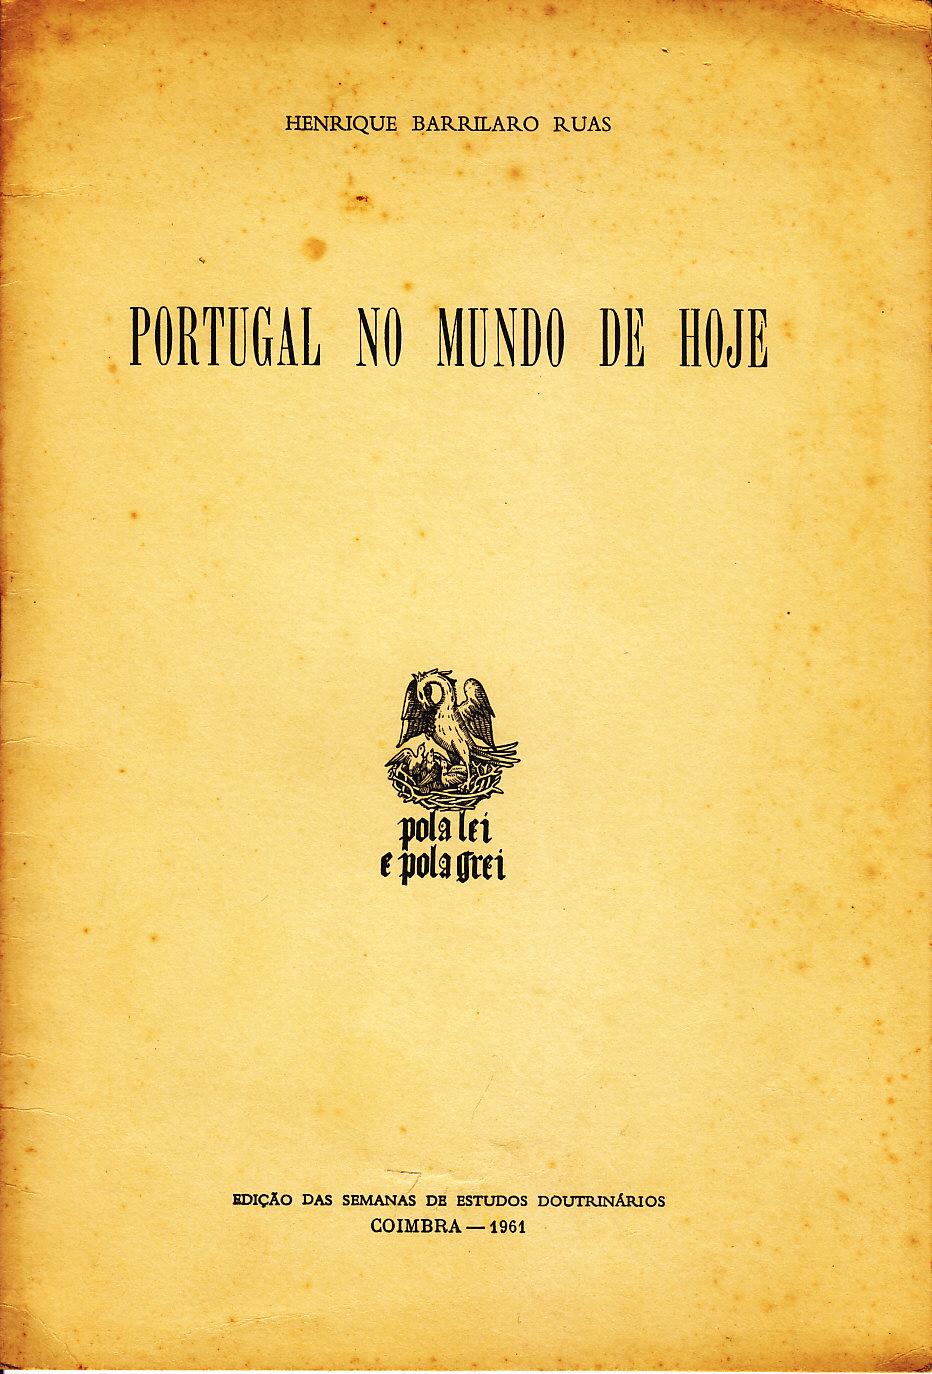 Barrilaro_Ruas